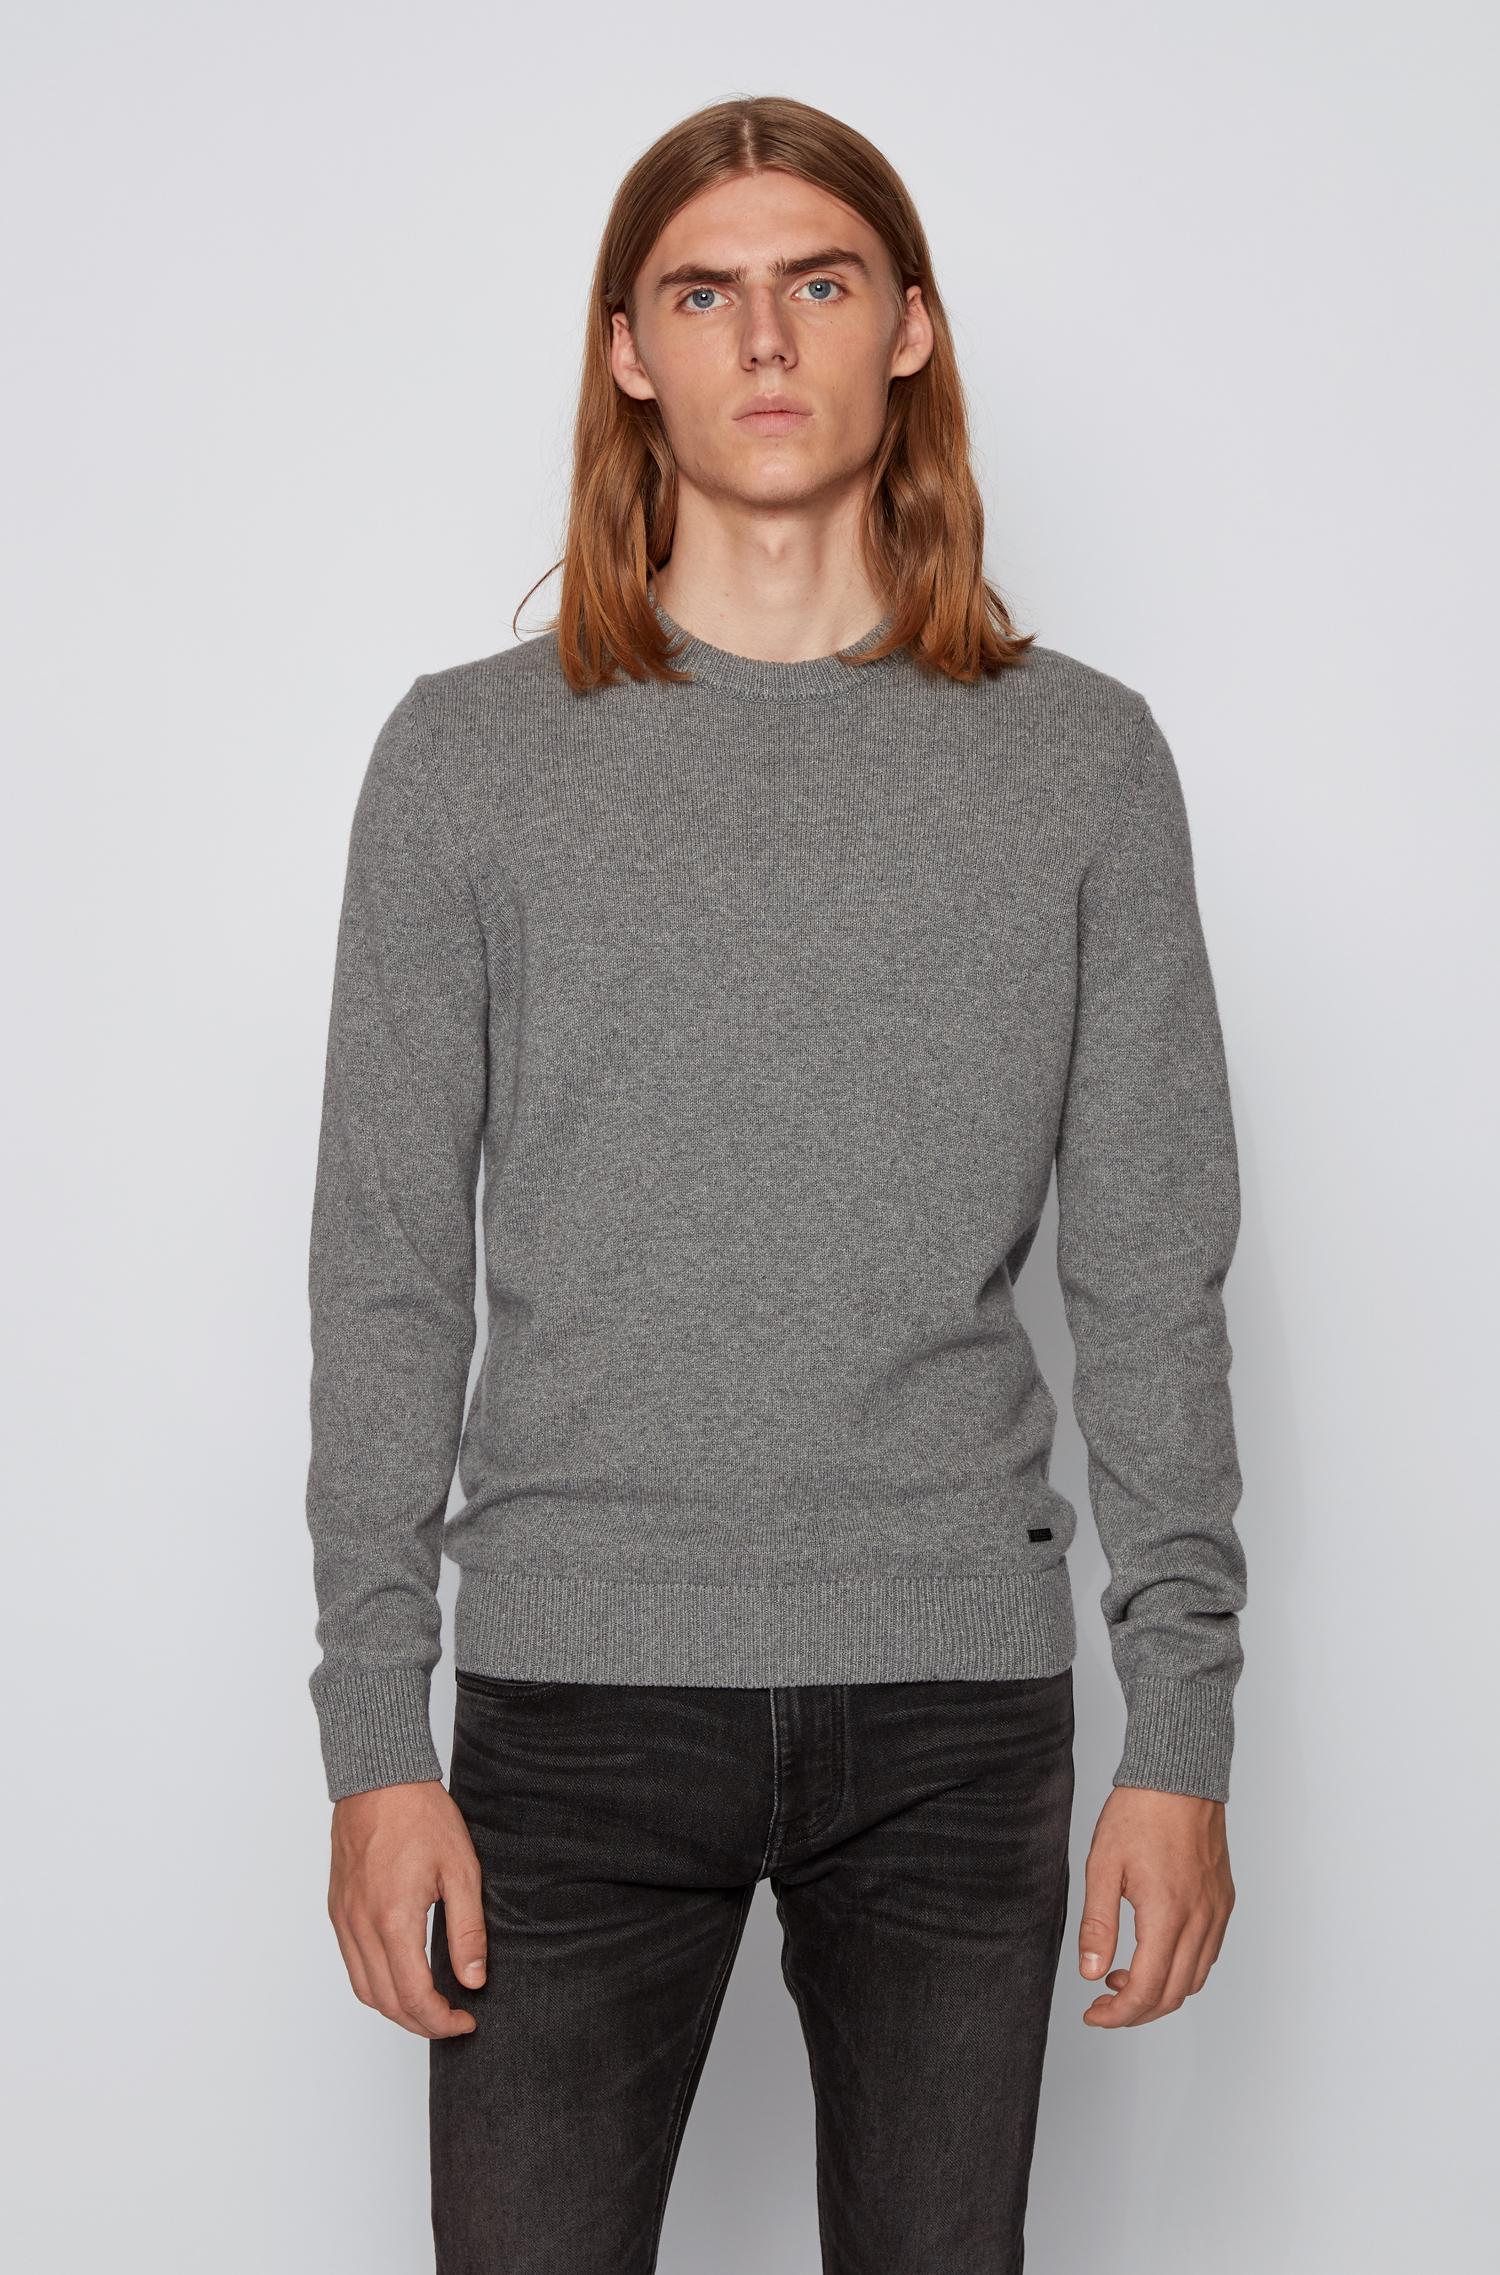 Hugo Boss Kontreal strik, medium grey, xx-large